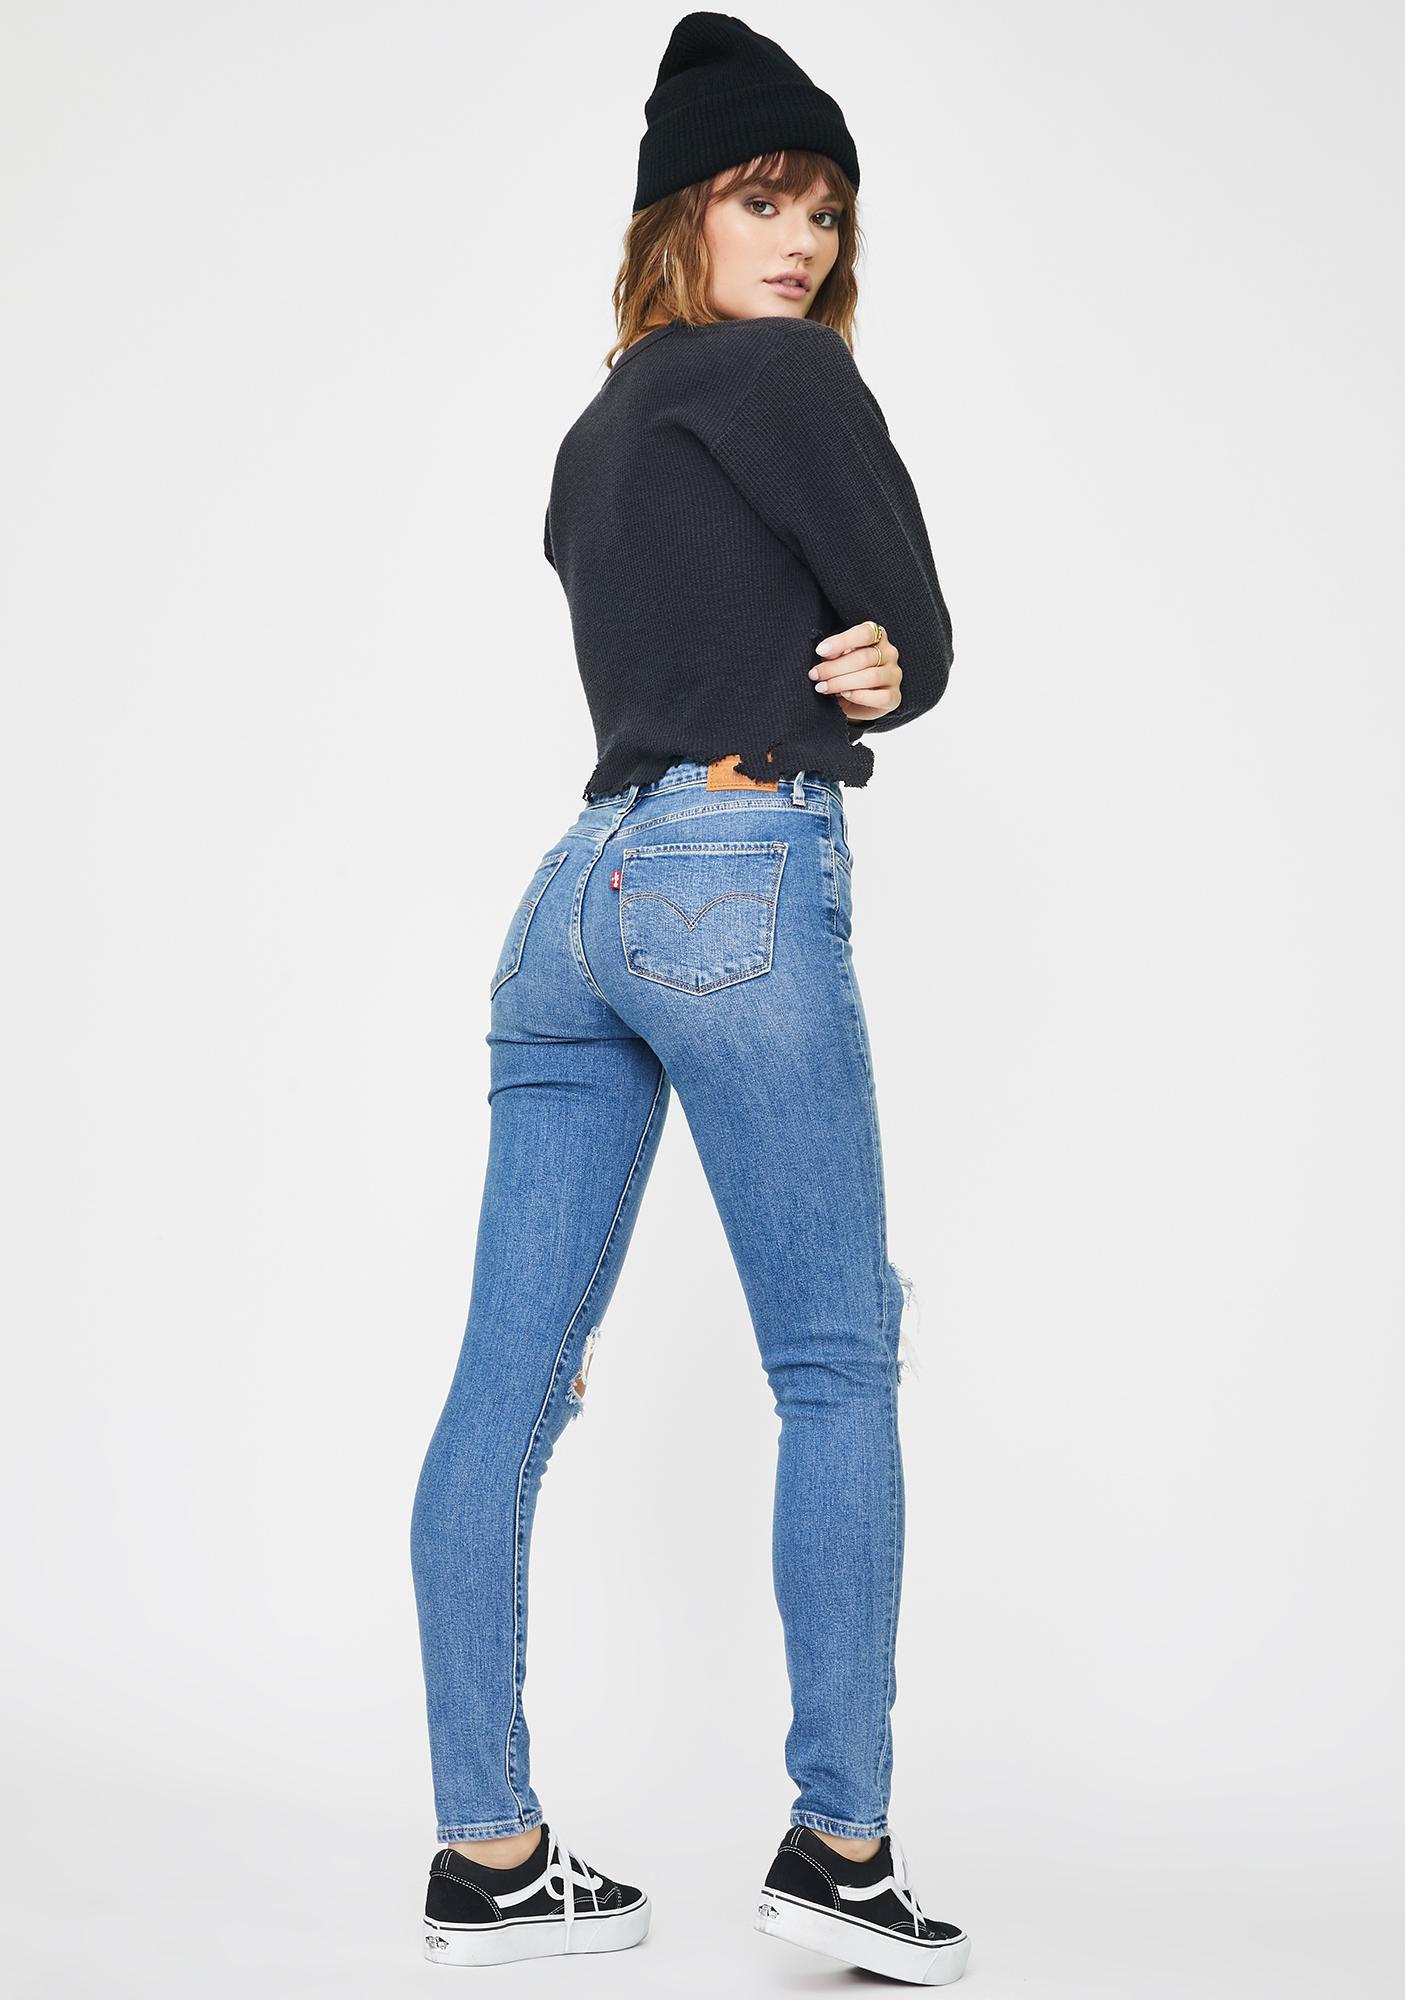 Levis Rugged Indigo 721 High Rise Skinny Jeans